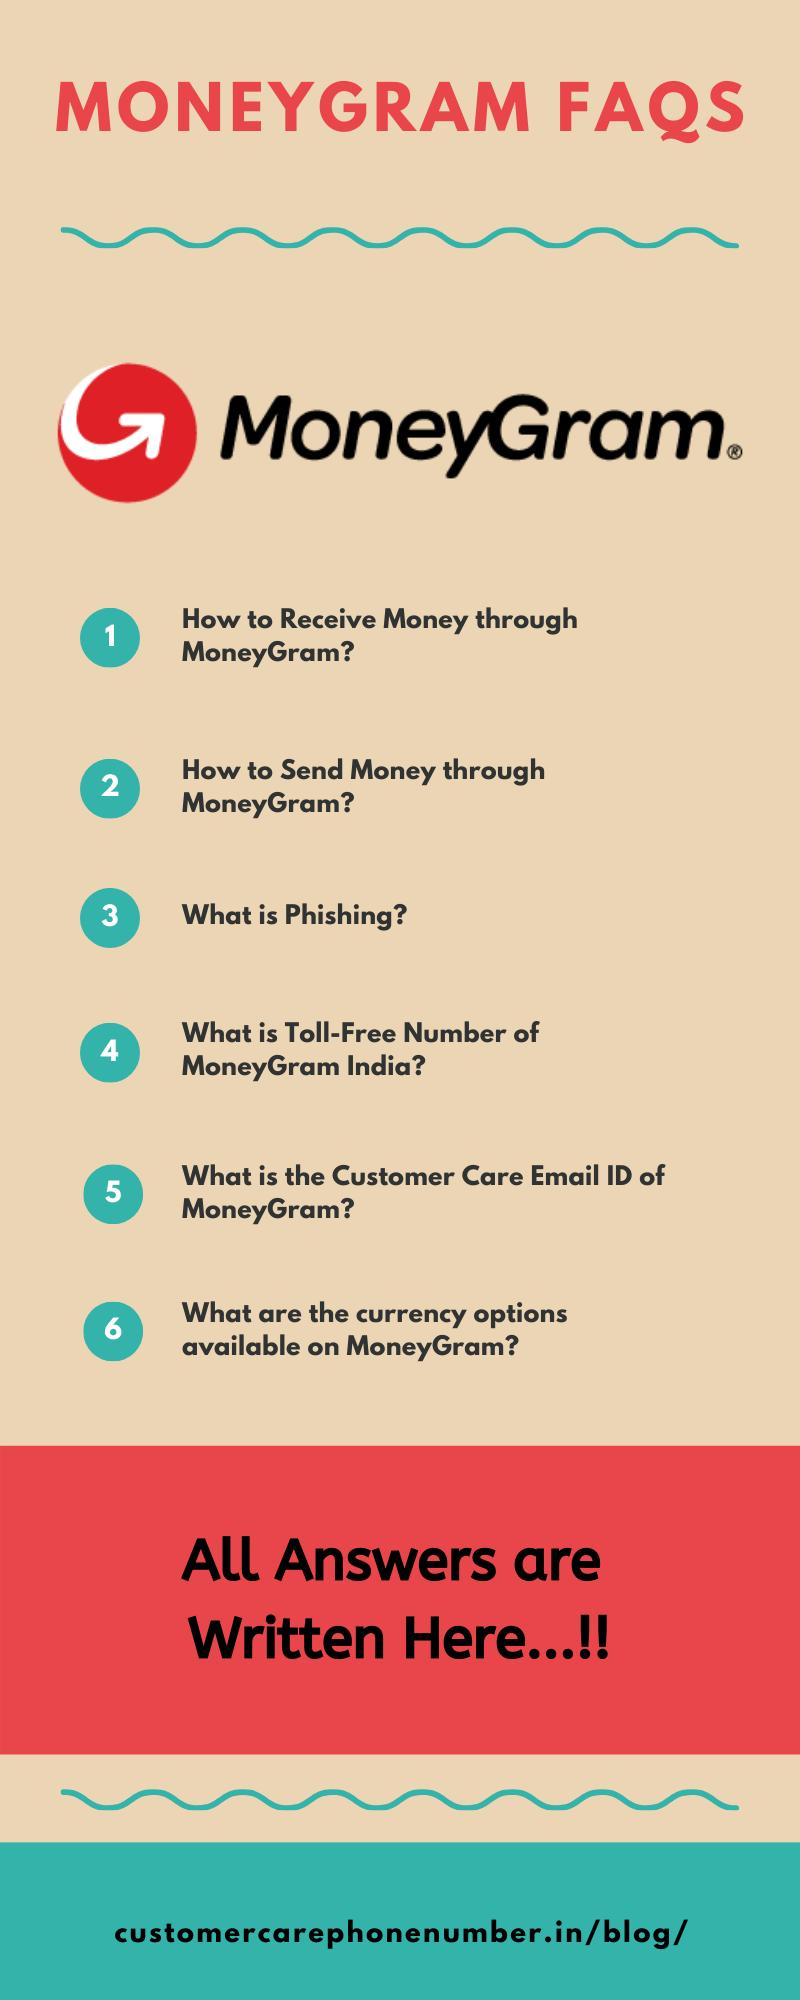 MoneyGram FAQs India, How to Receive Money through MoneyGram, How to Send Money through MoneyGram, What is Phishing.